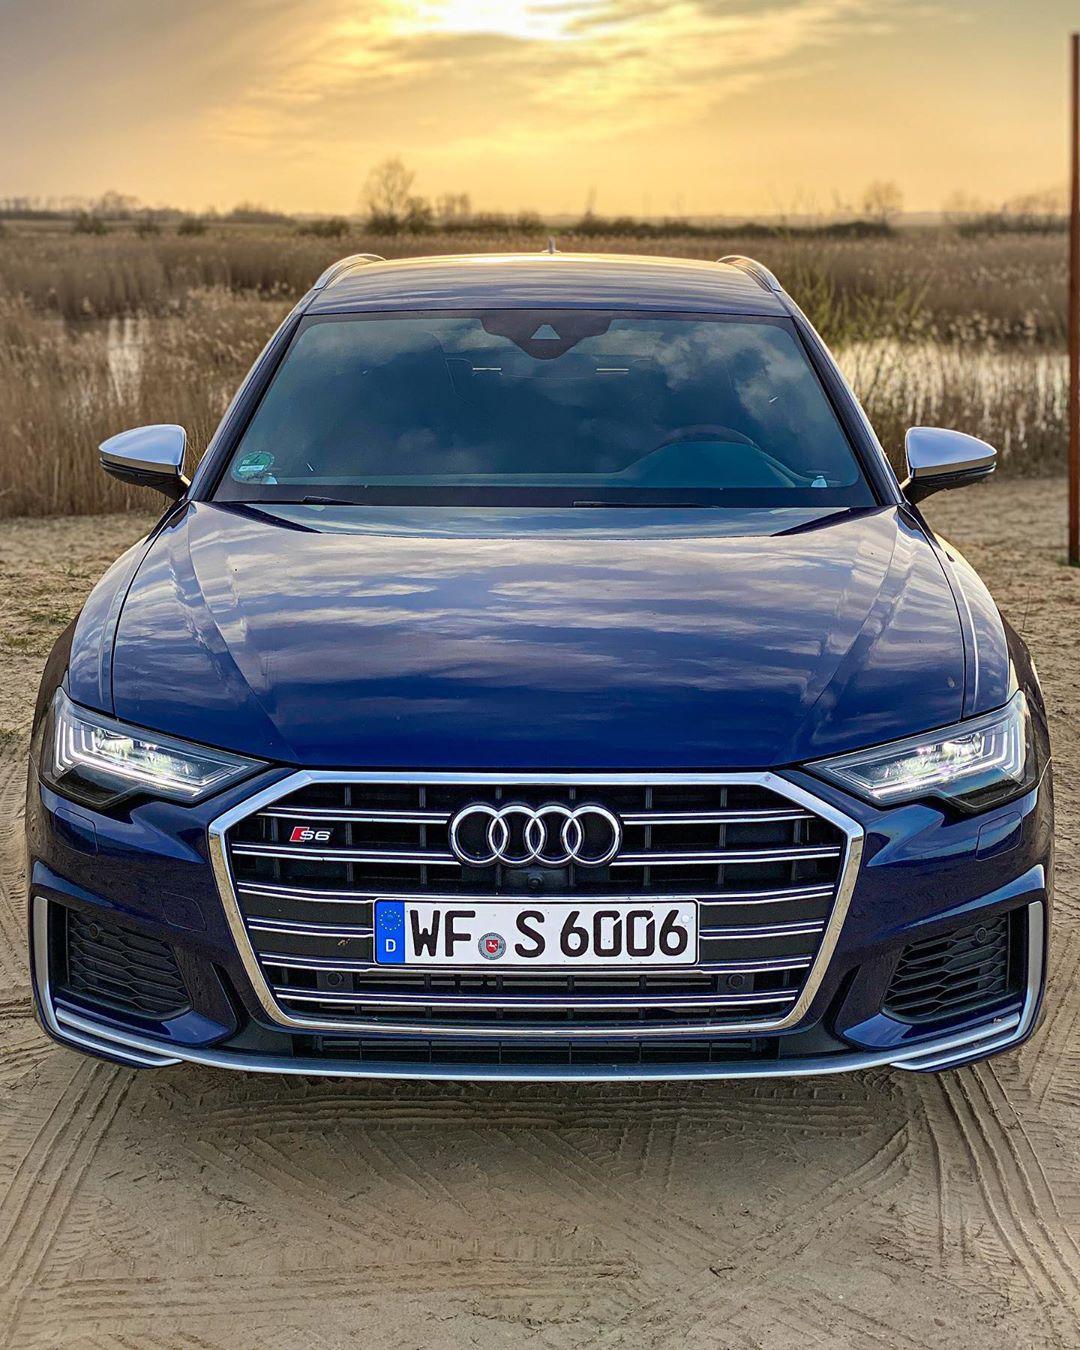 Just myself & the new S6🤷♂️….new Autobahn Video out on YouTube🤘🏁 #audis #audis6 #audia6c8 #audis6c8 #a6competition #s6 #s6avant #s6tdi #automanntv #automannsgarage #navarrablue